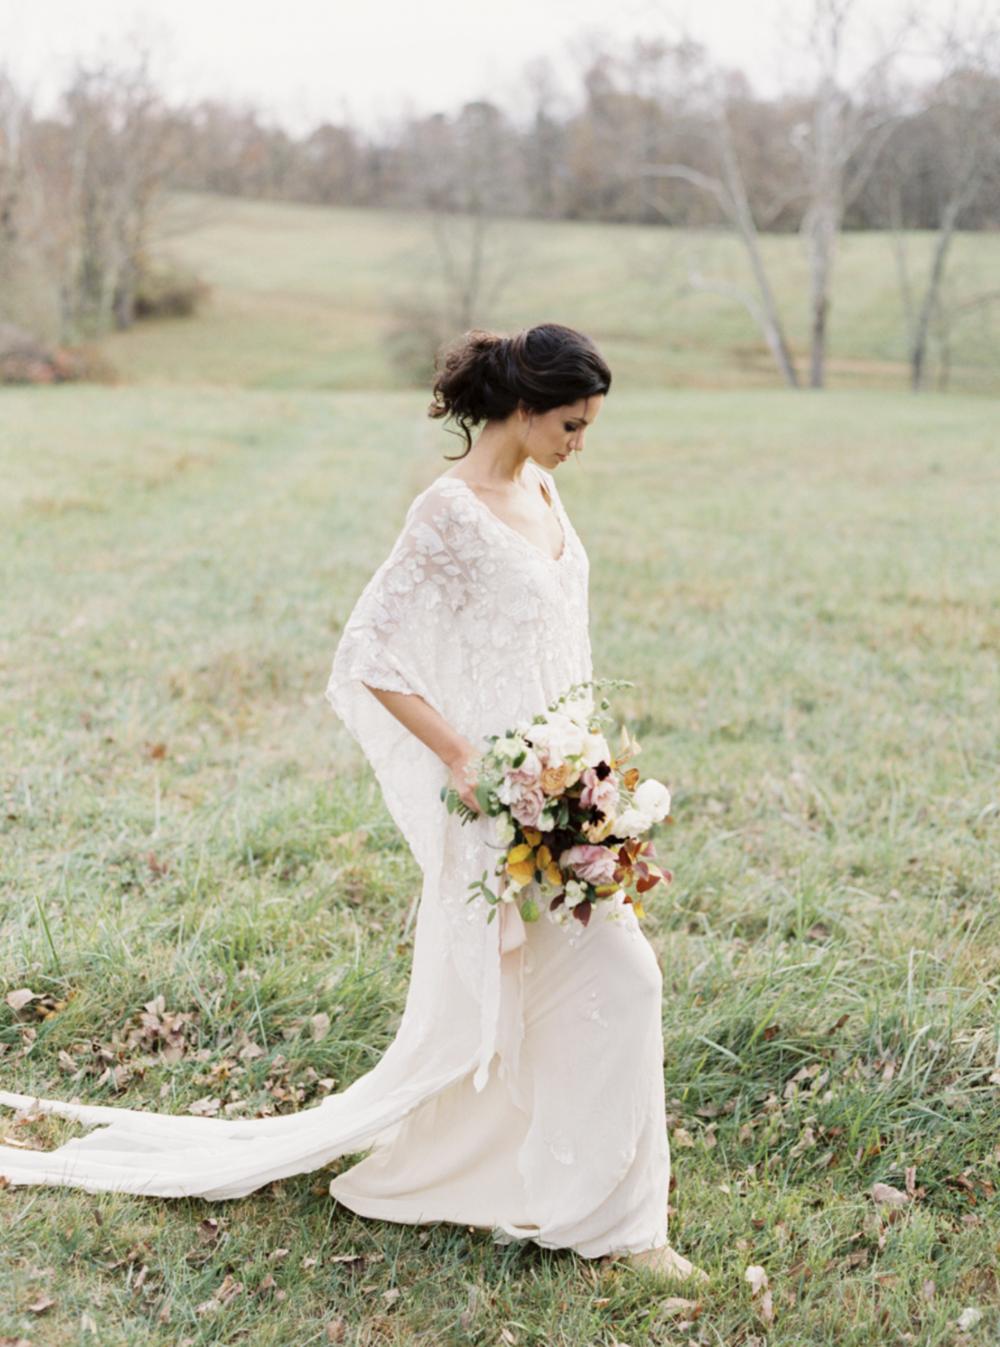 Carol Hannah Bridal Iolite Gown Shanon Moffit Photography 13.png